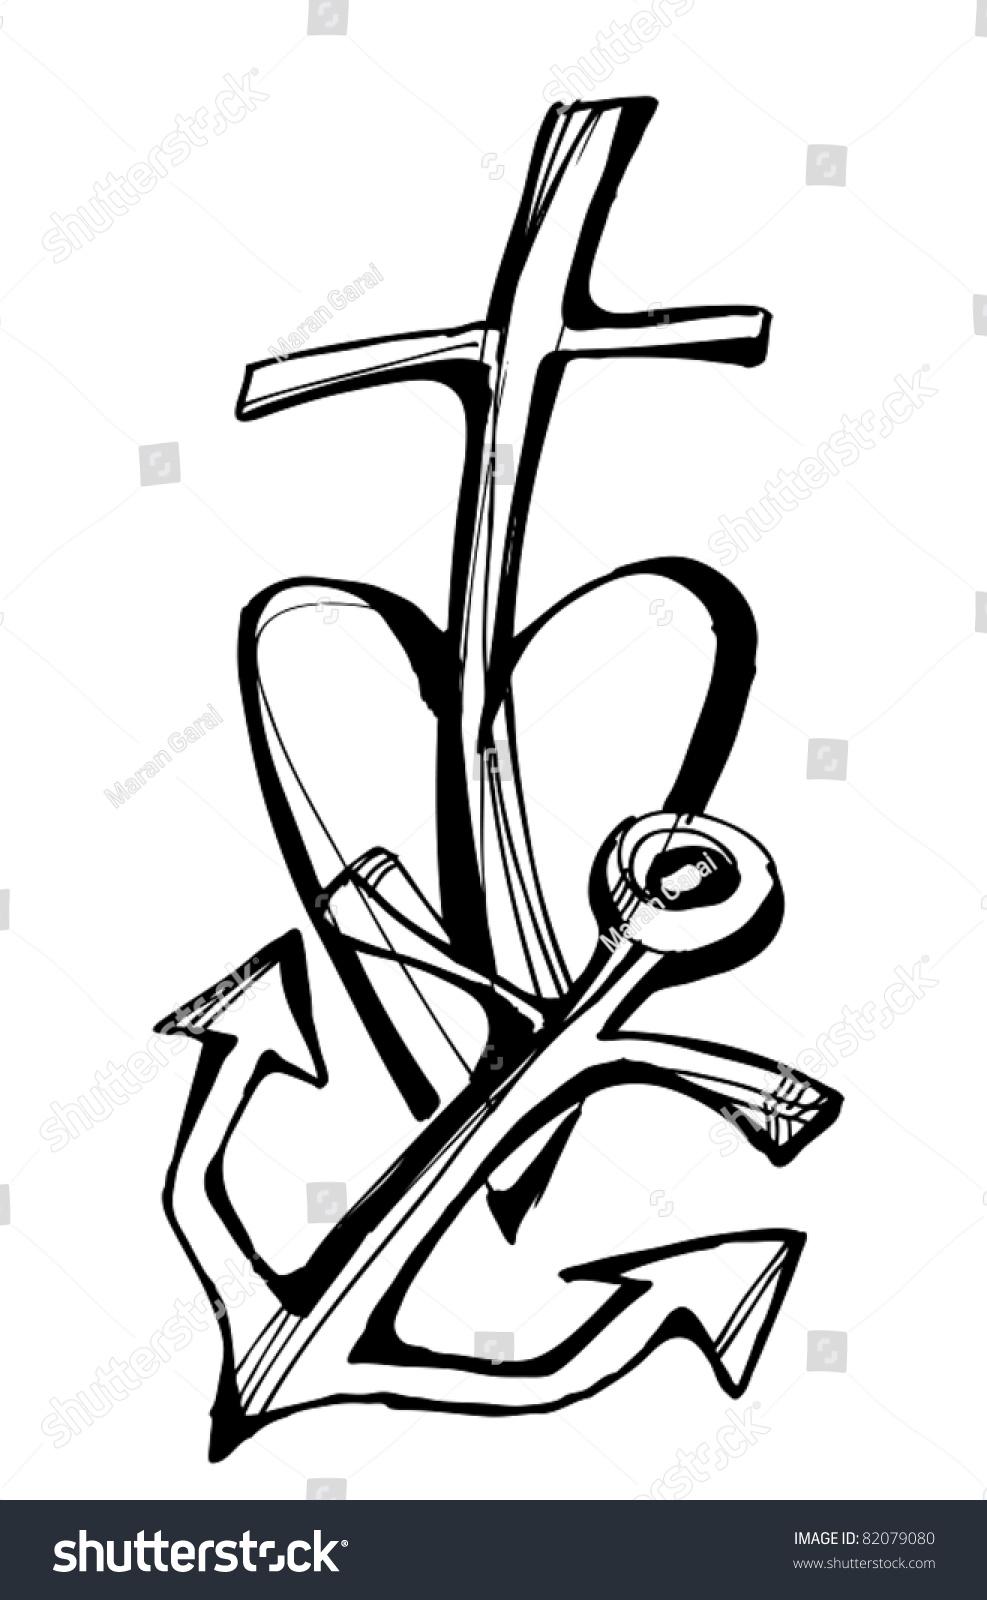 рисунки символов 2014